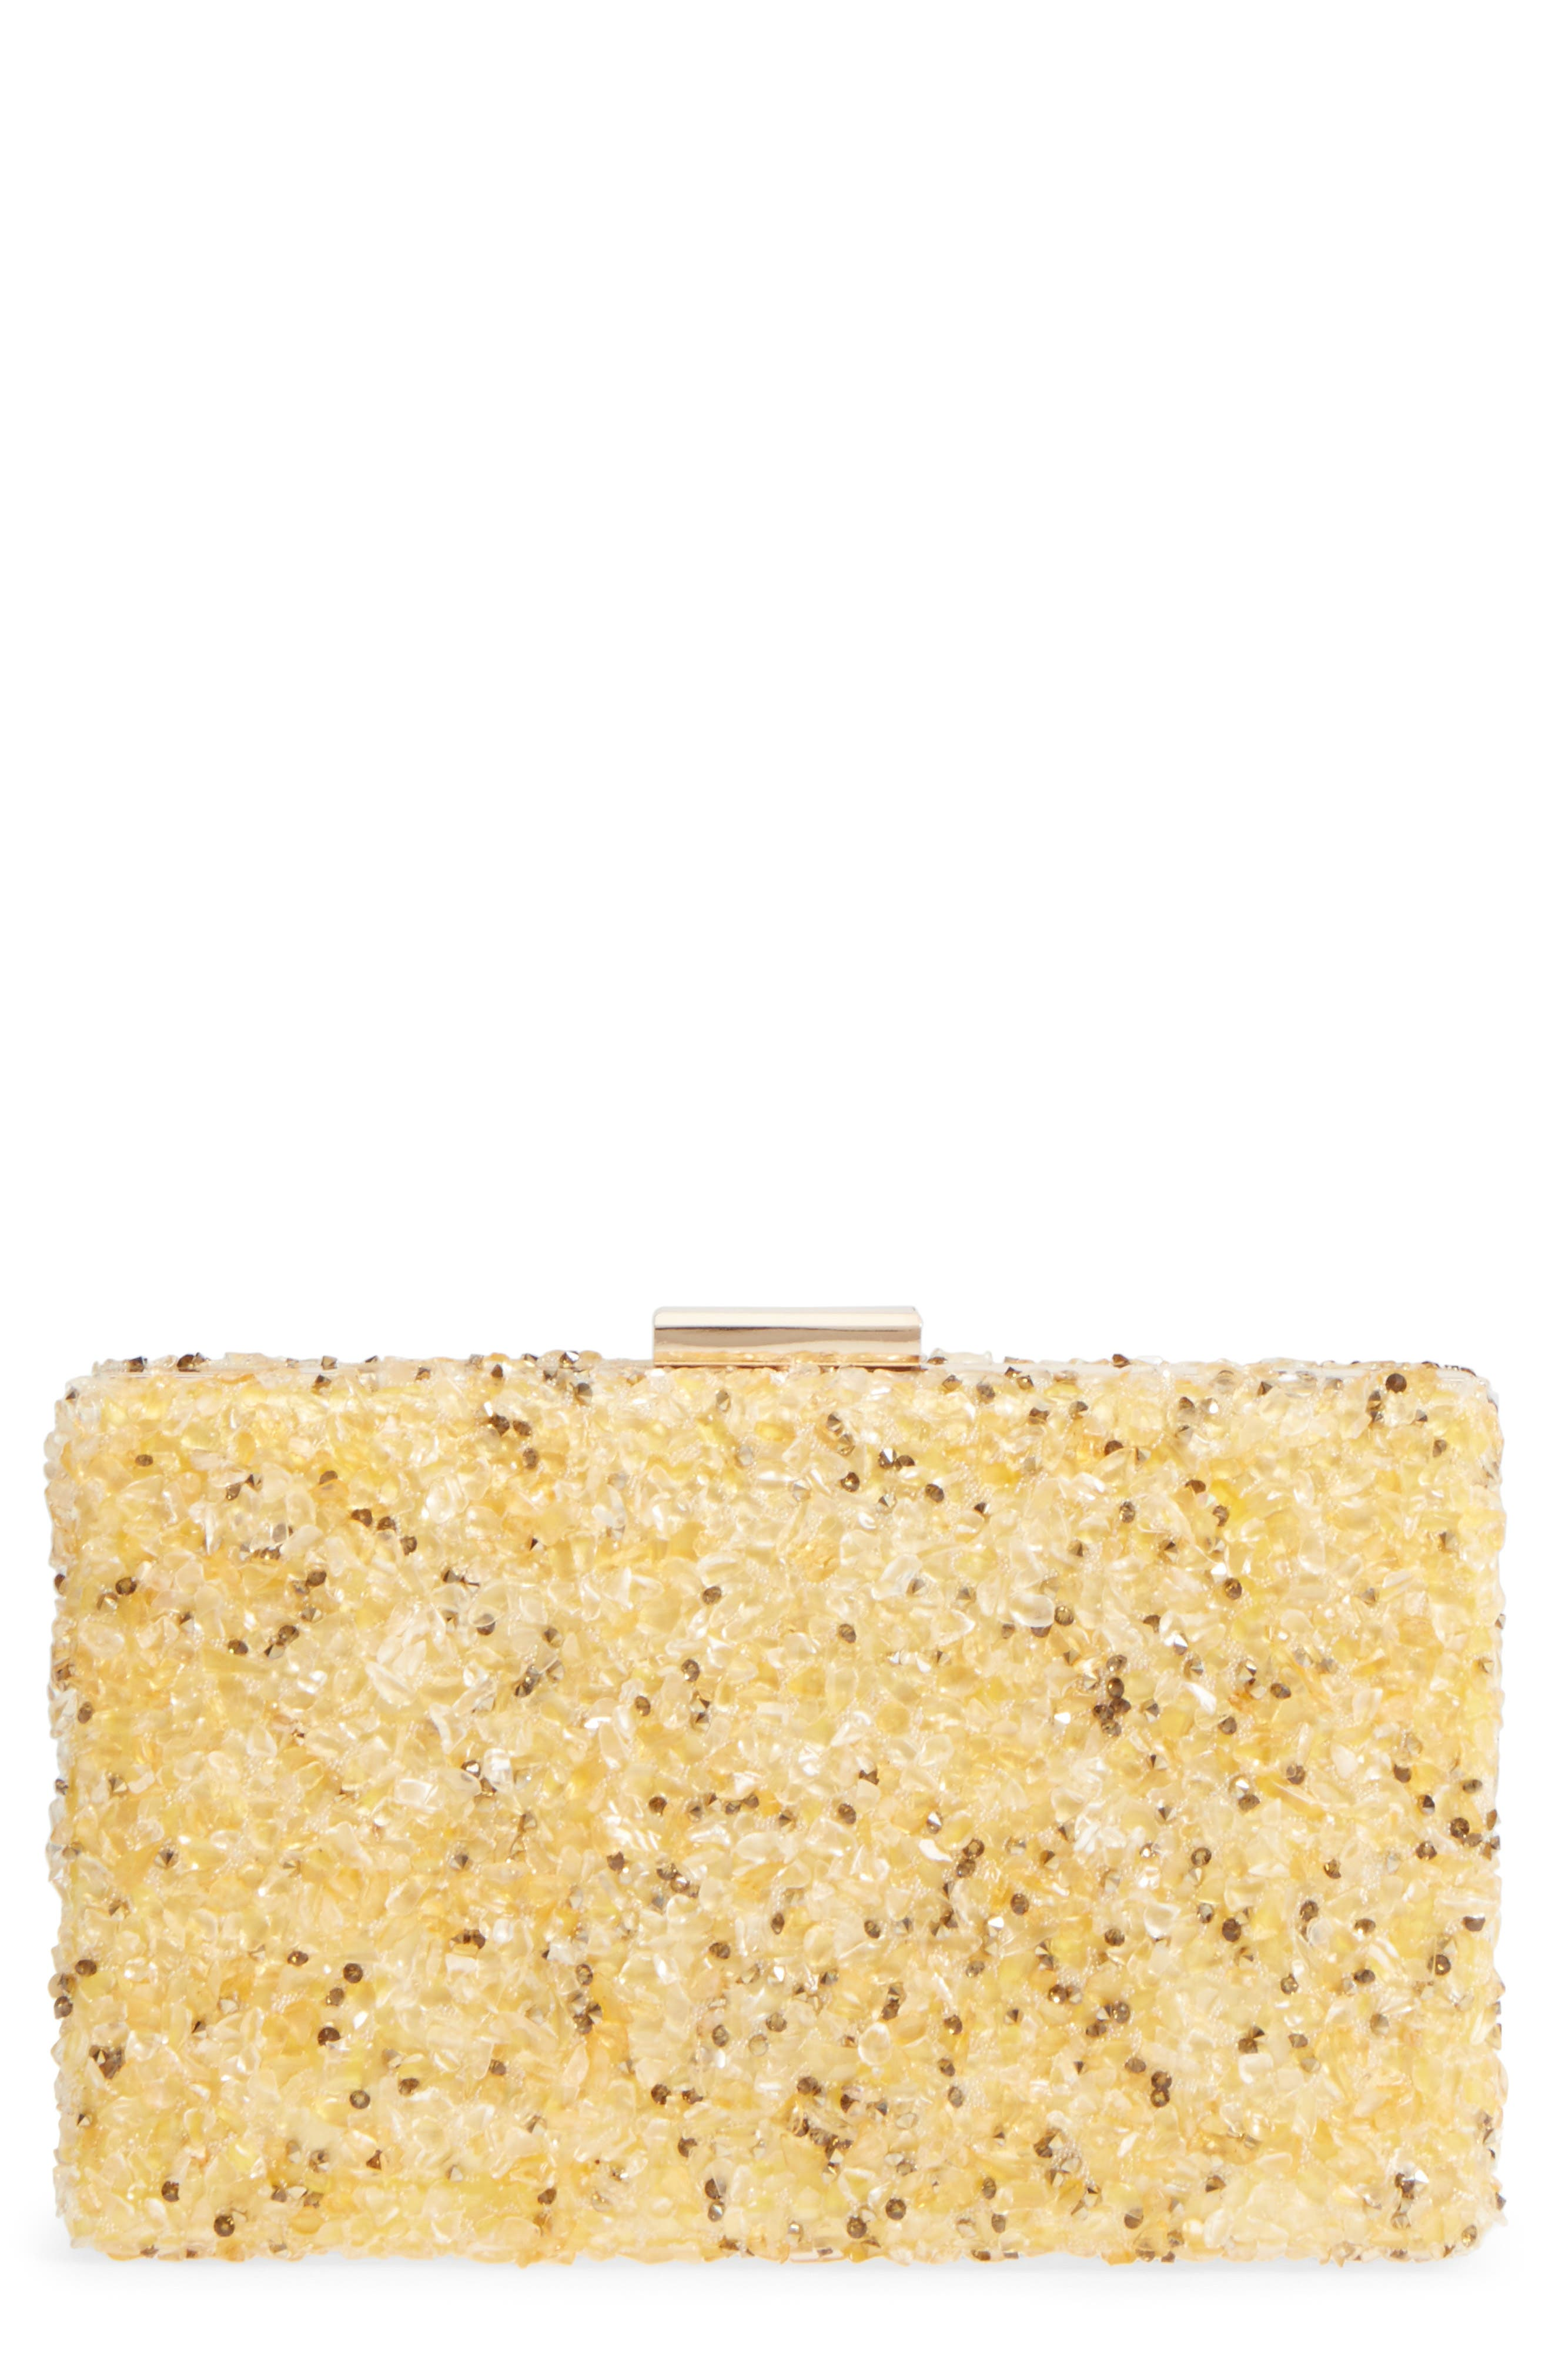 Natasha Couture Chips Embellished Box Clutch